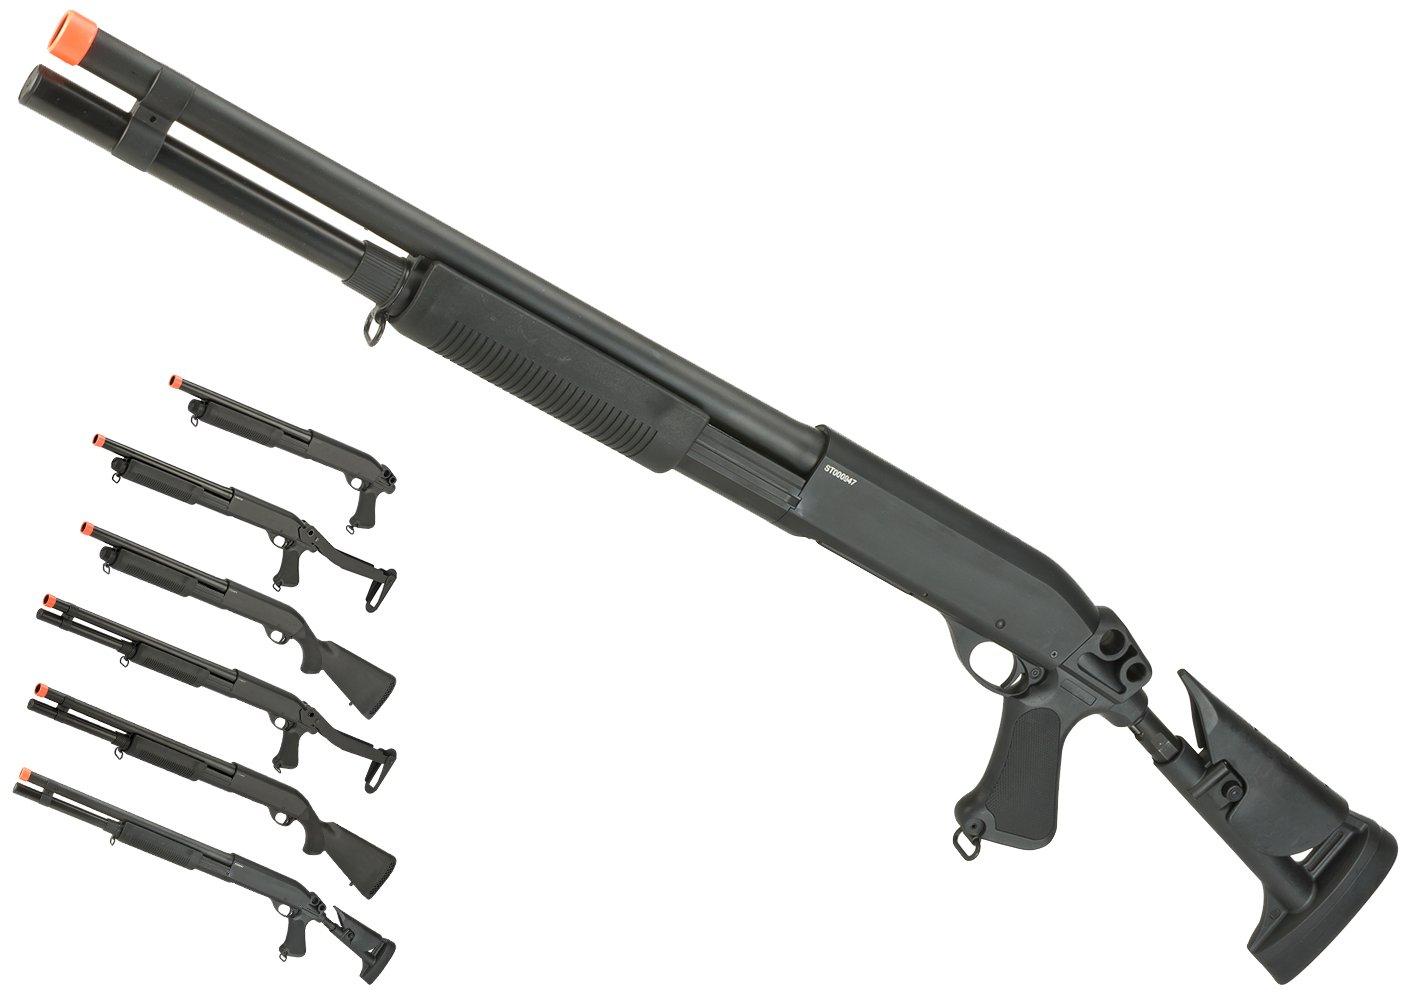 Evike - CYMA Full Metal M870 3-Round Burst Multi-Shot Shell Loading Airsoft Shotgun - Retractable Stock/Long Barrel - (60168) by Evike